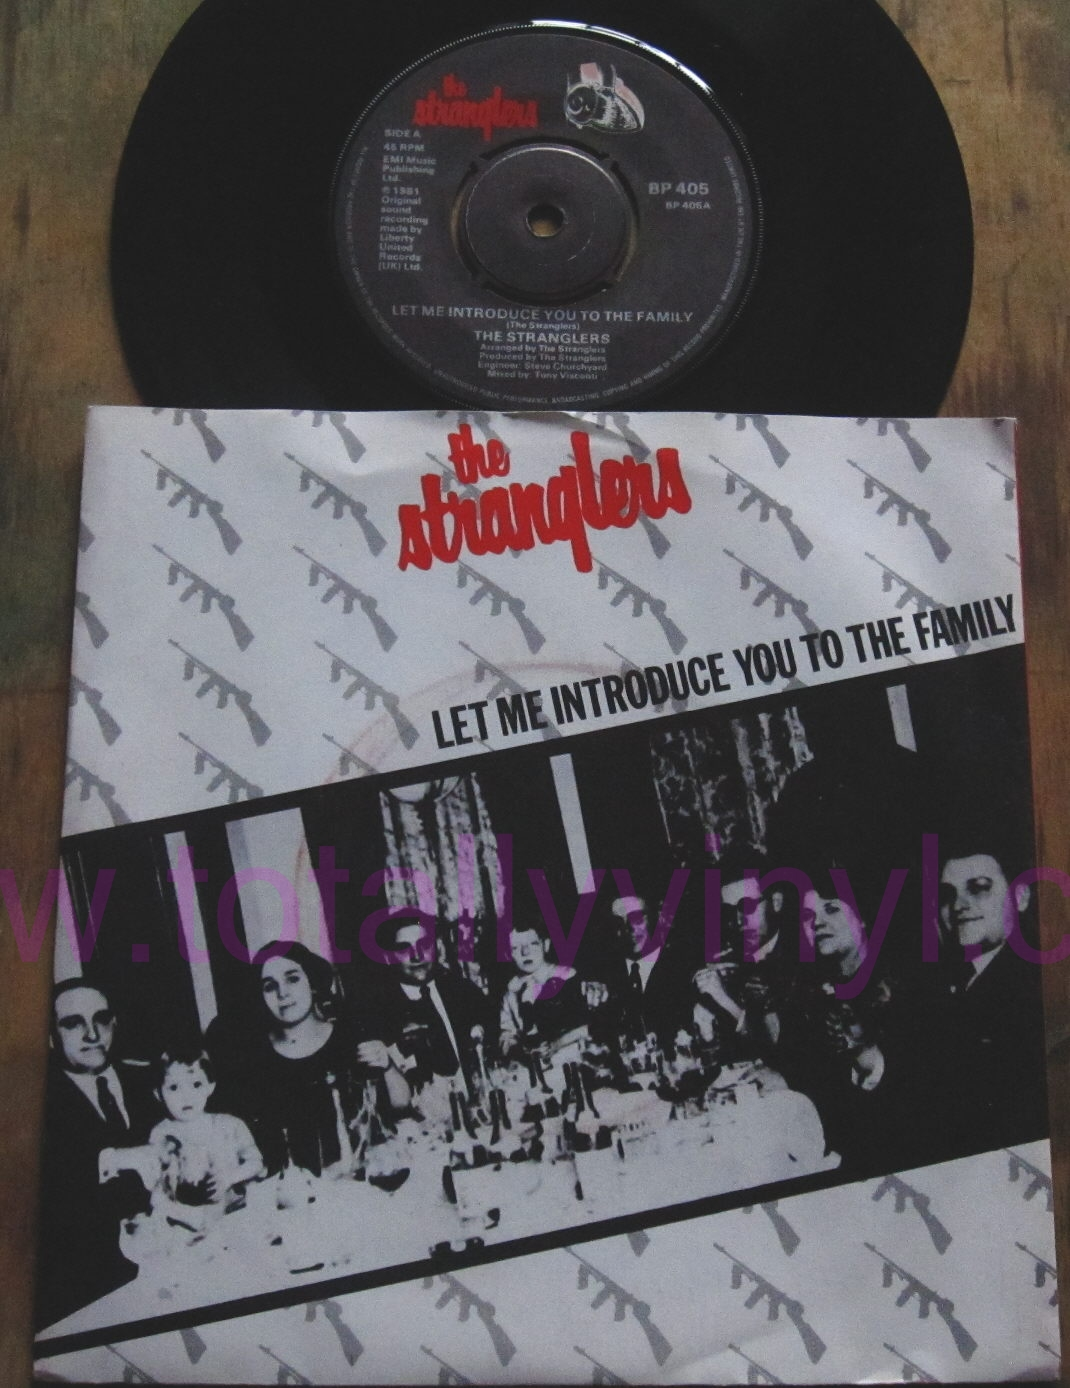 Totally Vinyl Records Stranglers The Let Me